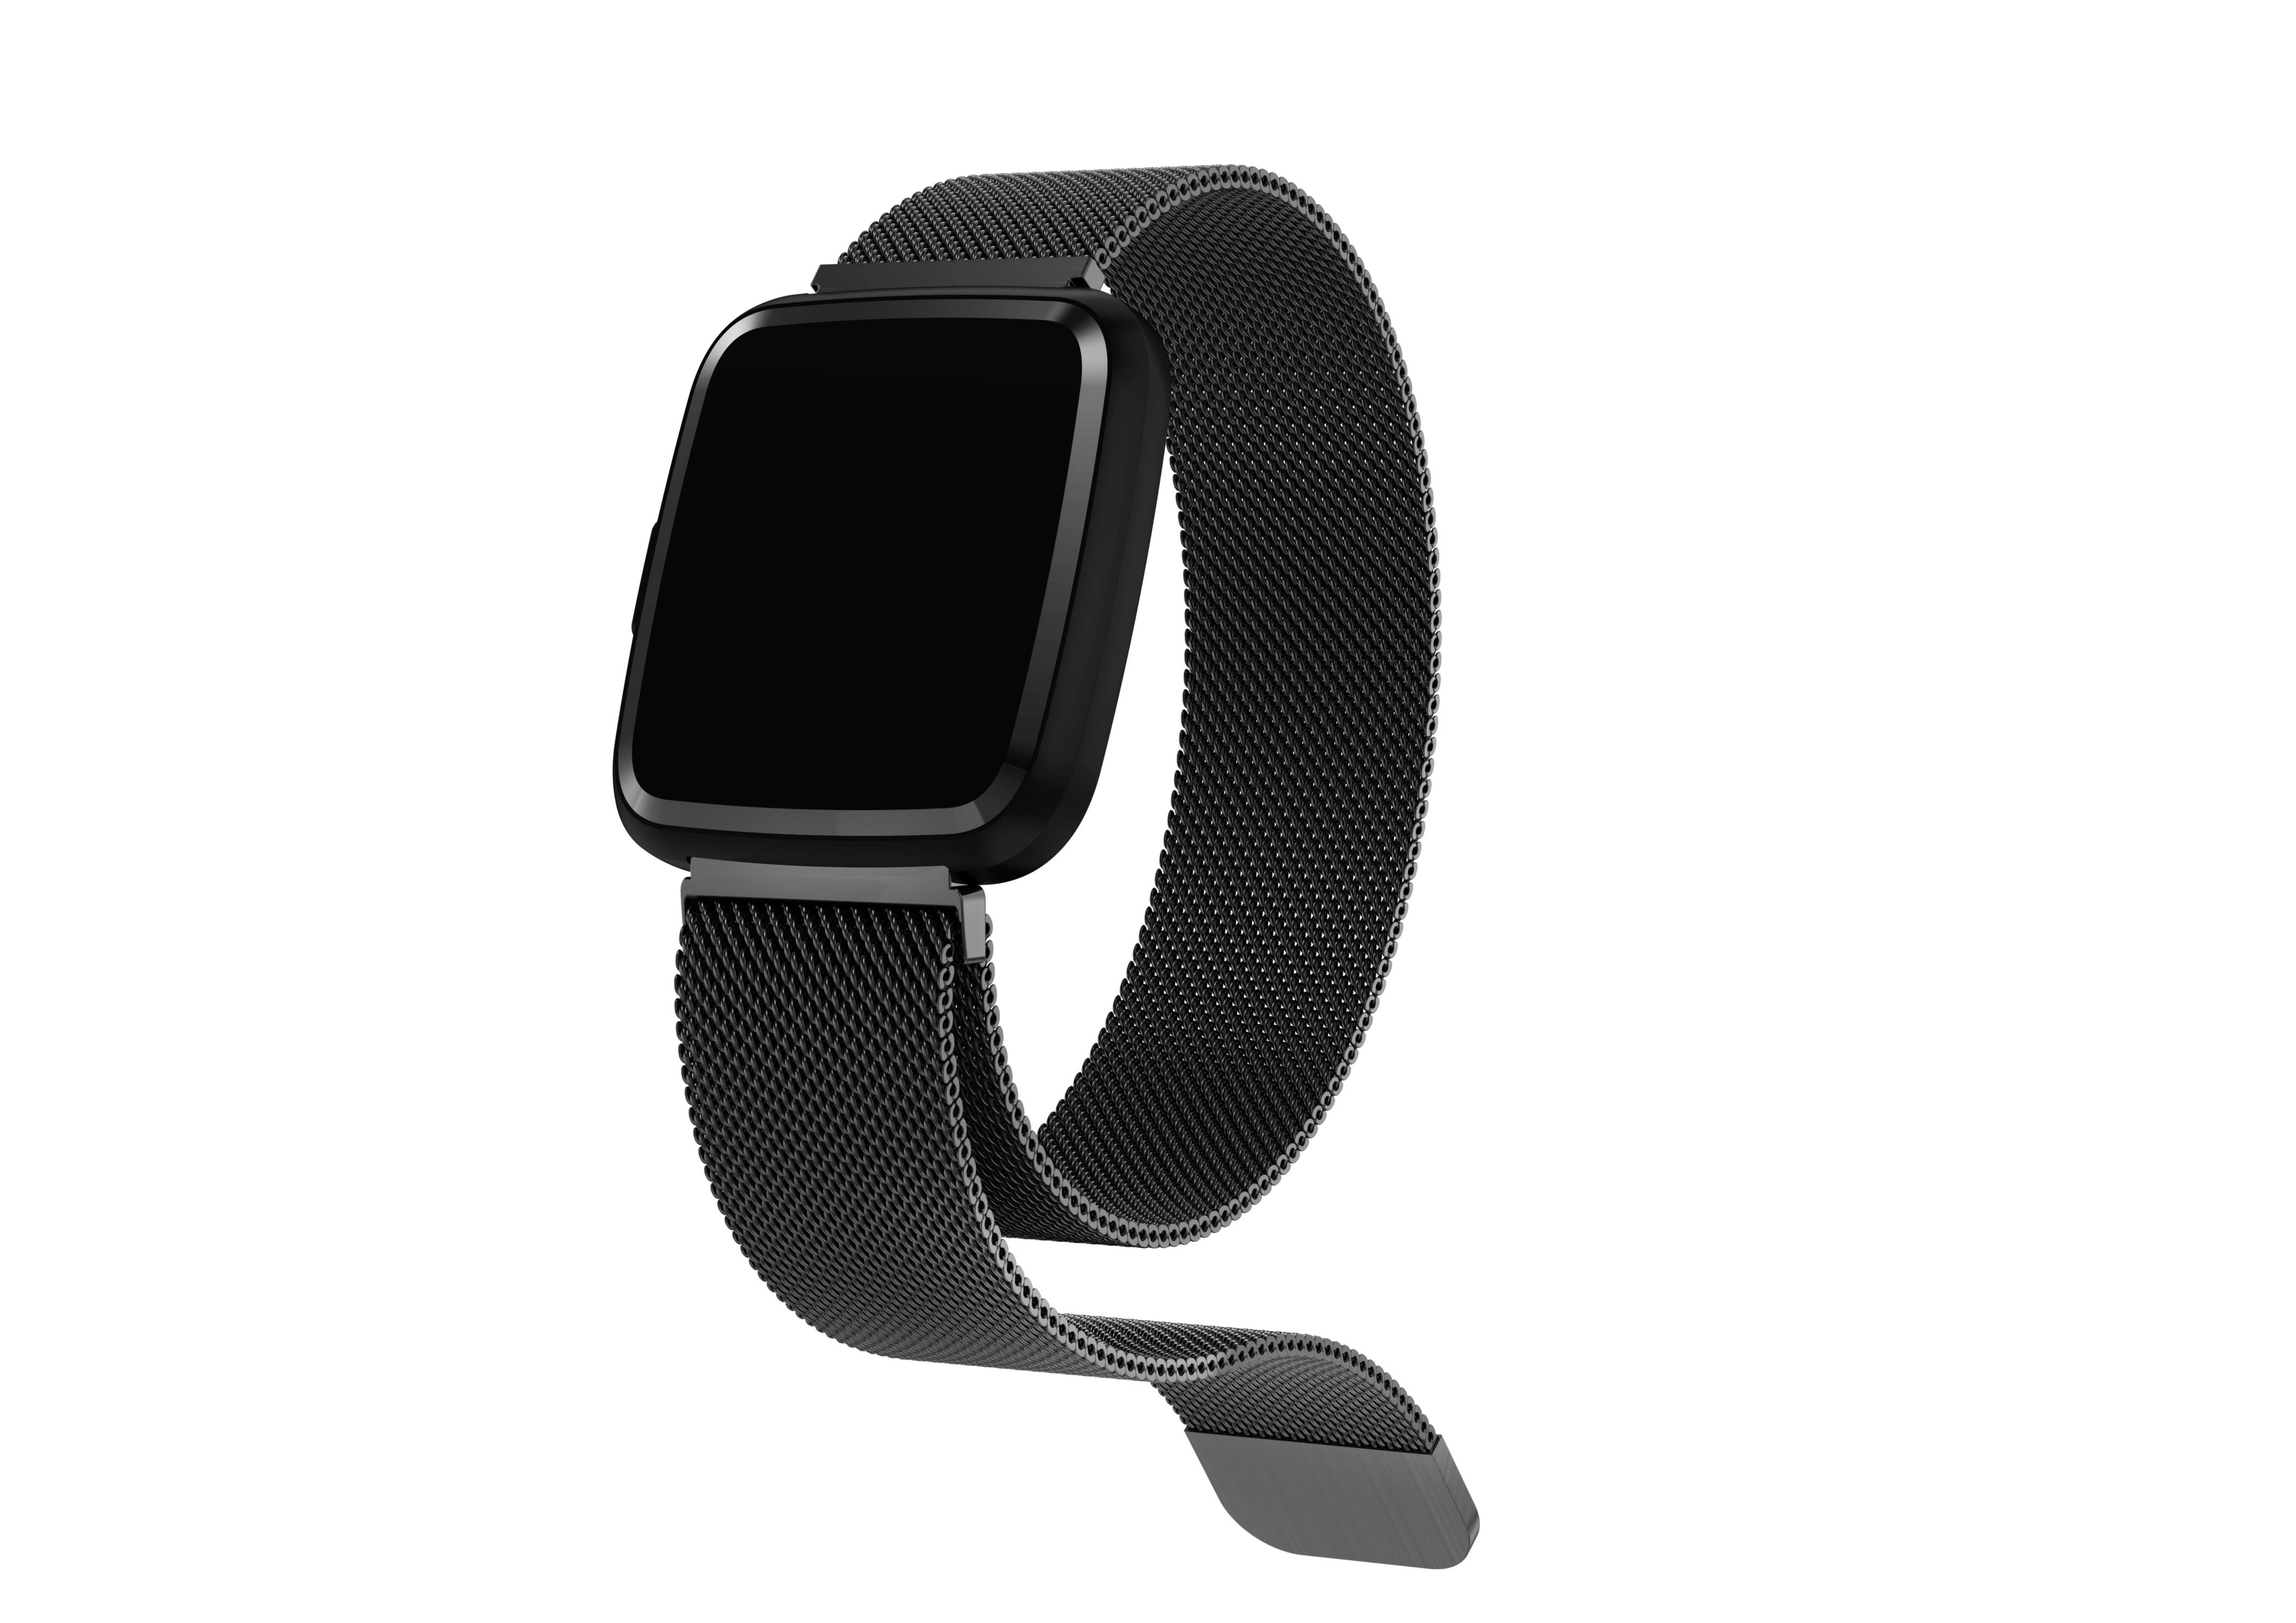 Bratara fitness curea metalica Optimus AT 7 ecran color, smartwatch, pedometru, puls, notificari, black [3]